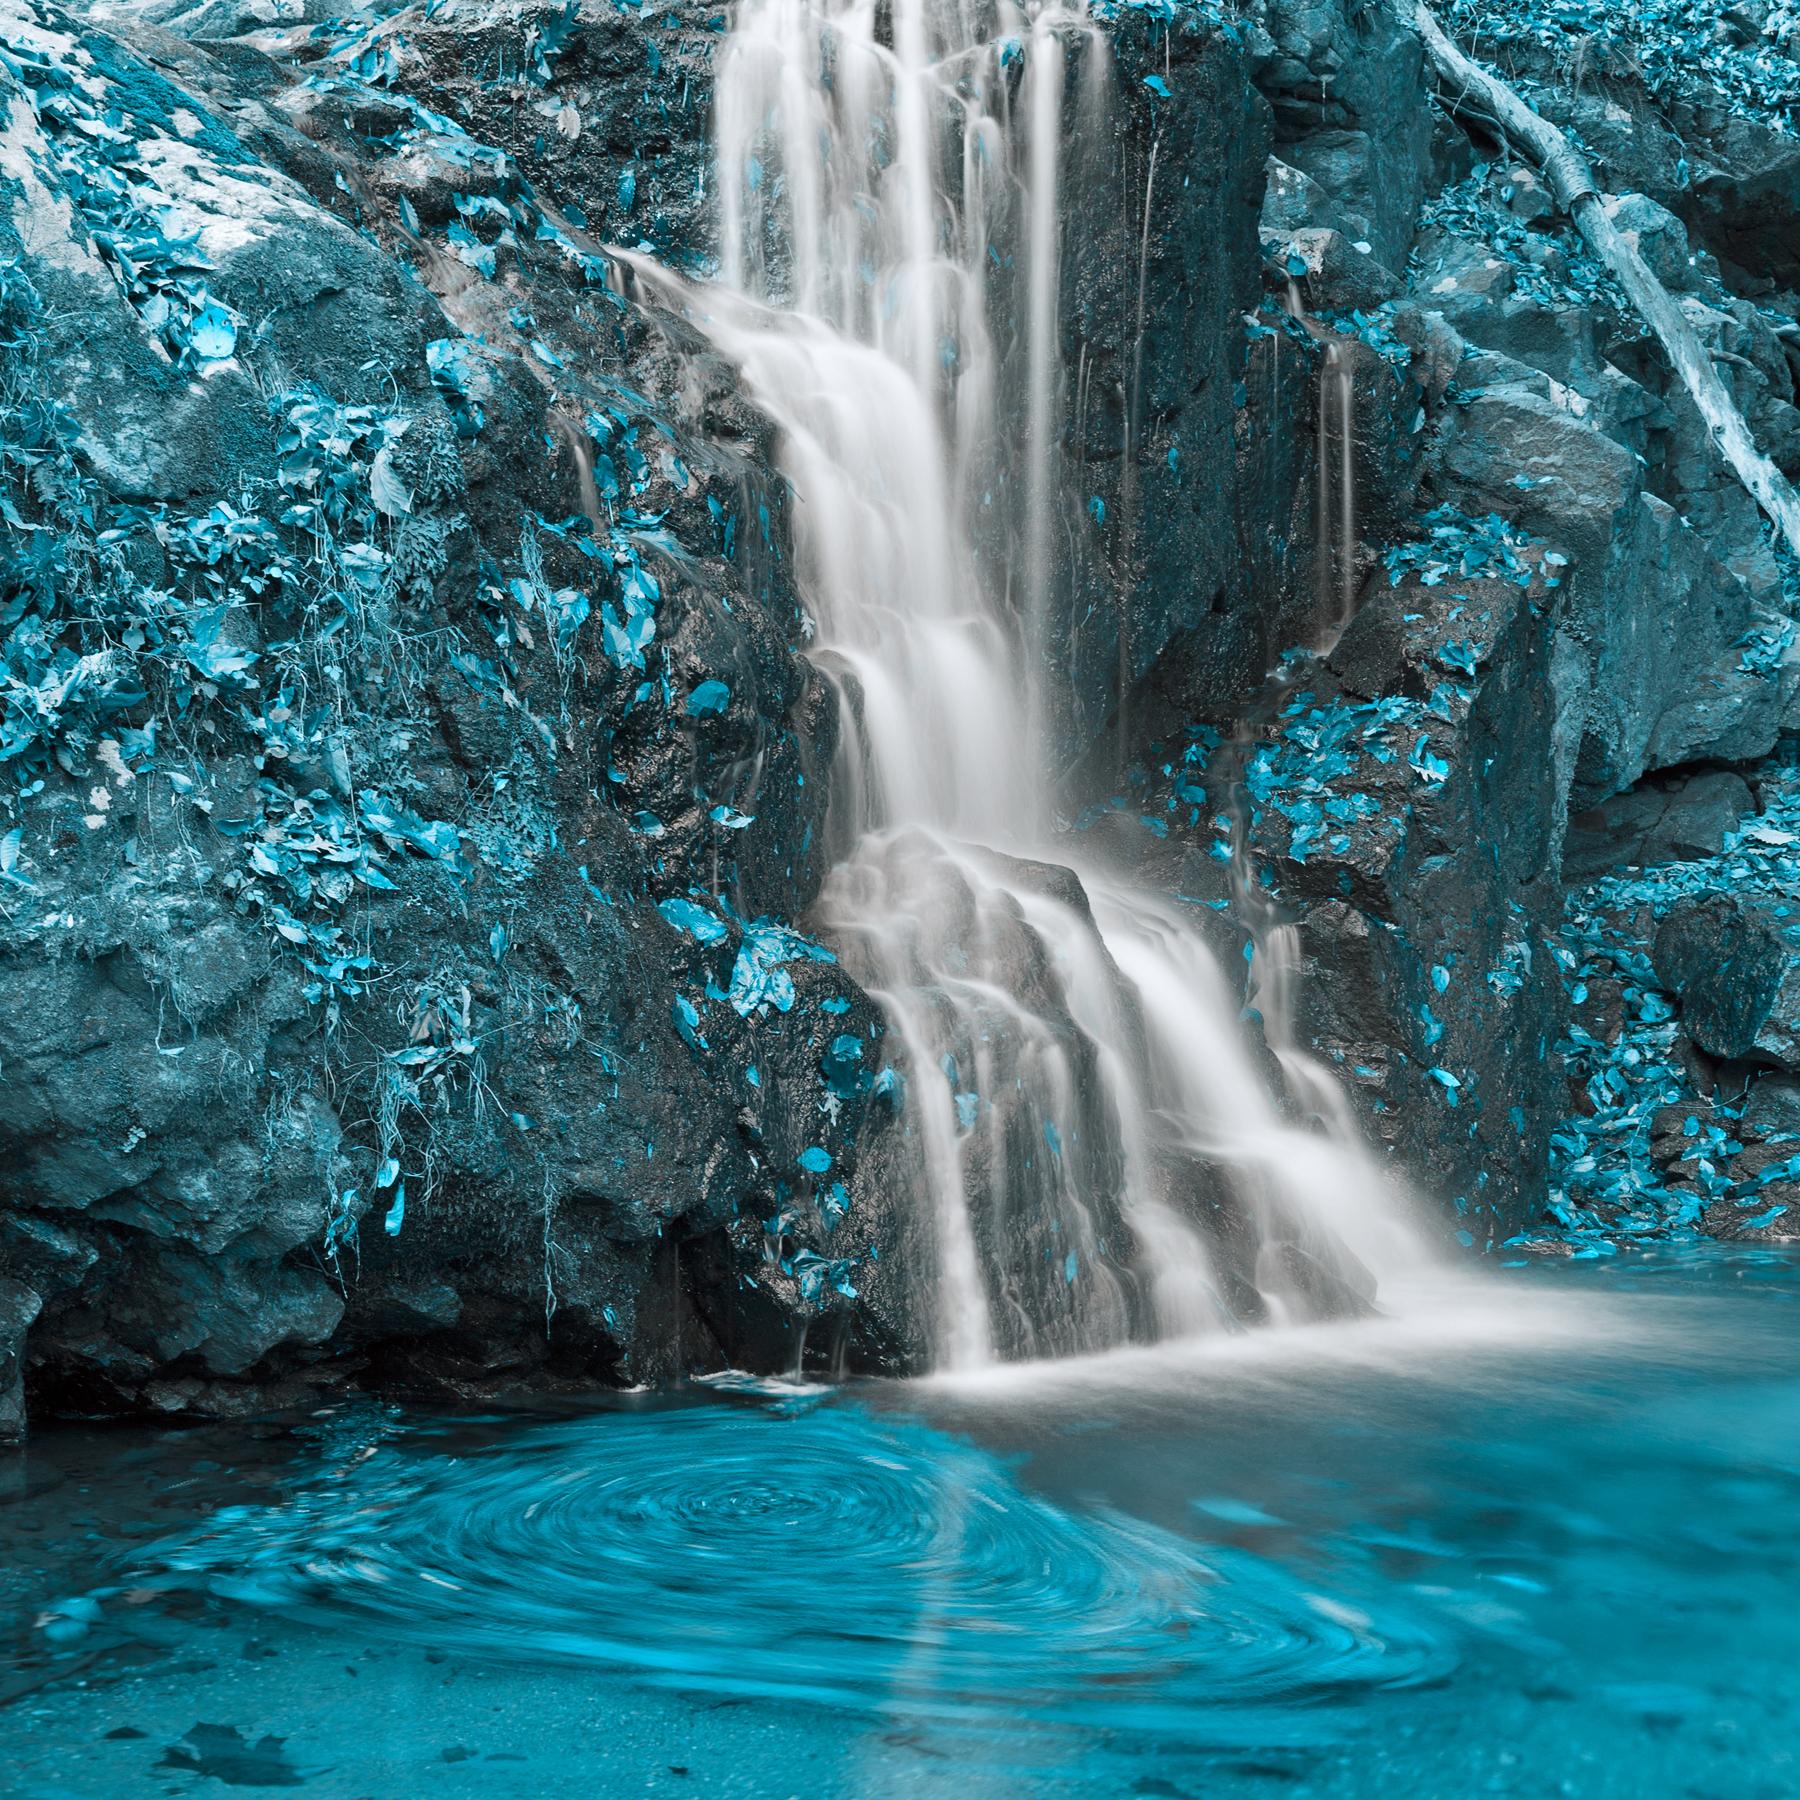 Aquamarine Falls, Rotating, Spectacular, Soft, Smooth, HQ Photo